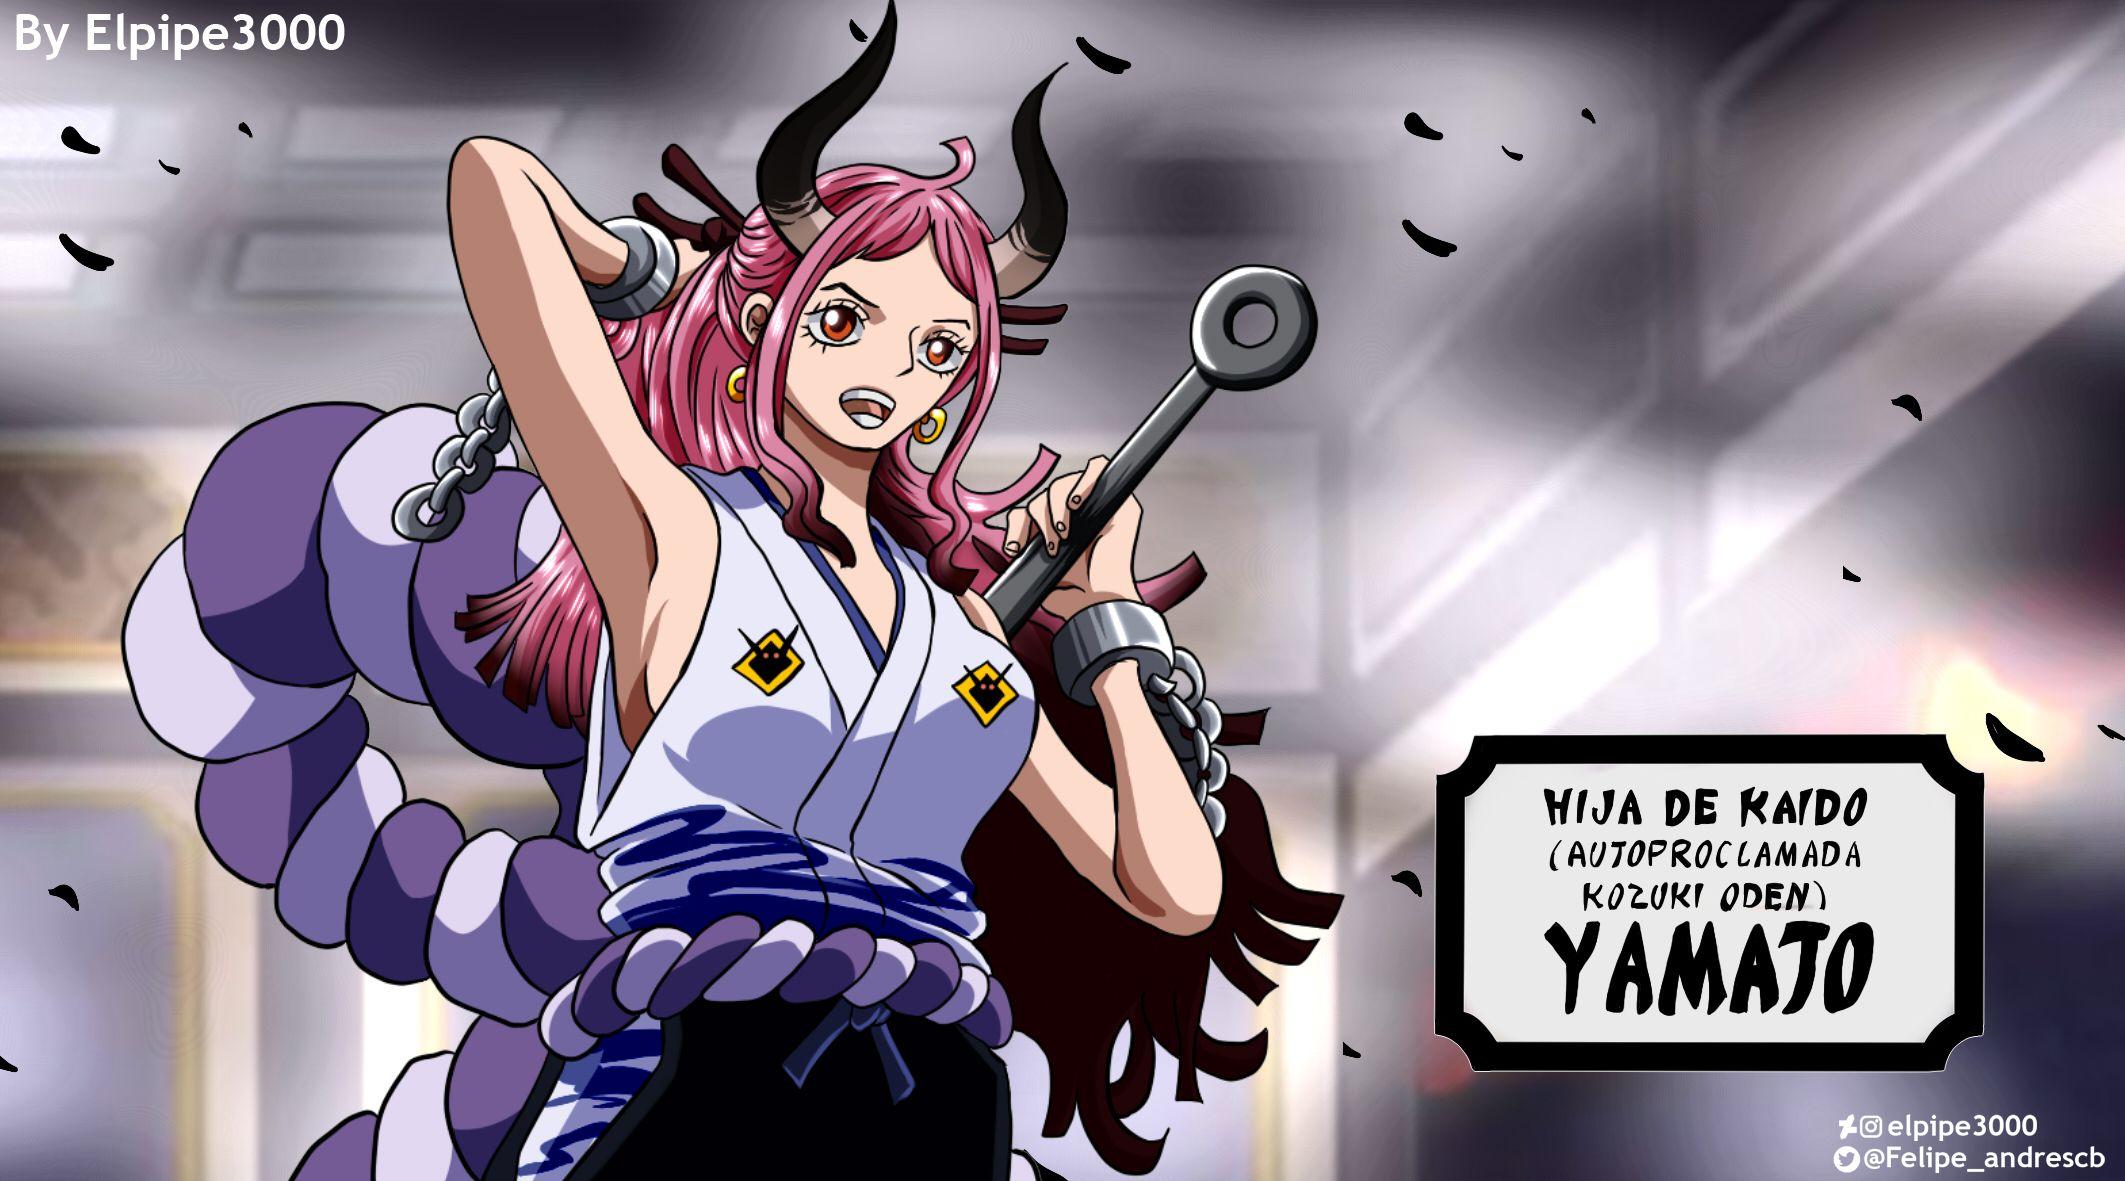 One Piece 984 Yamato Aparece by elpipe3000 on DeviantArt